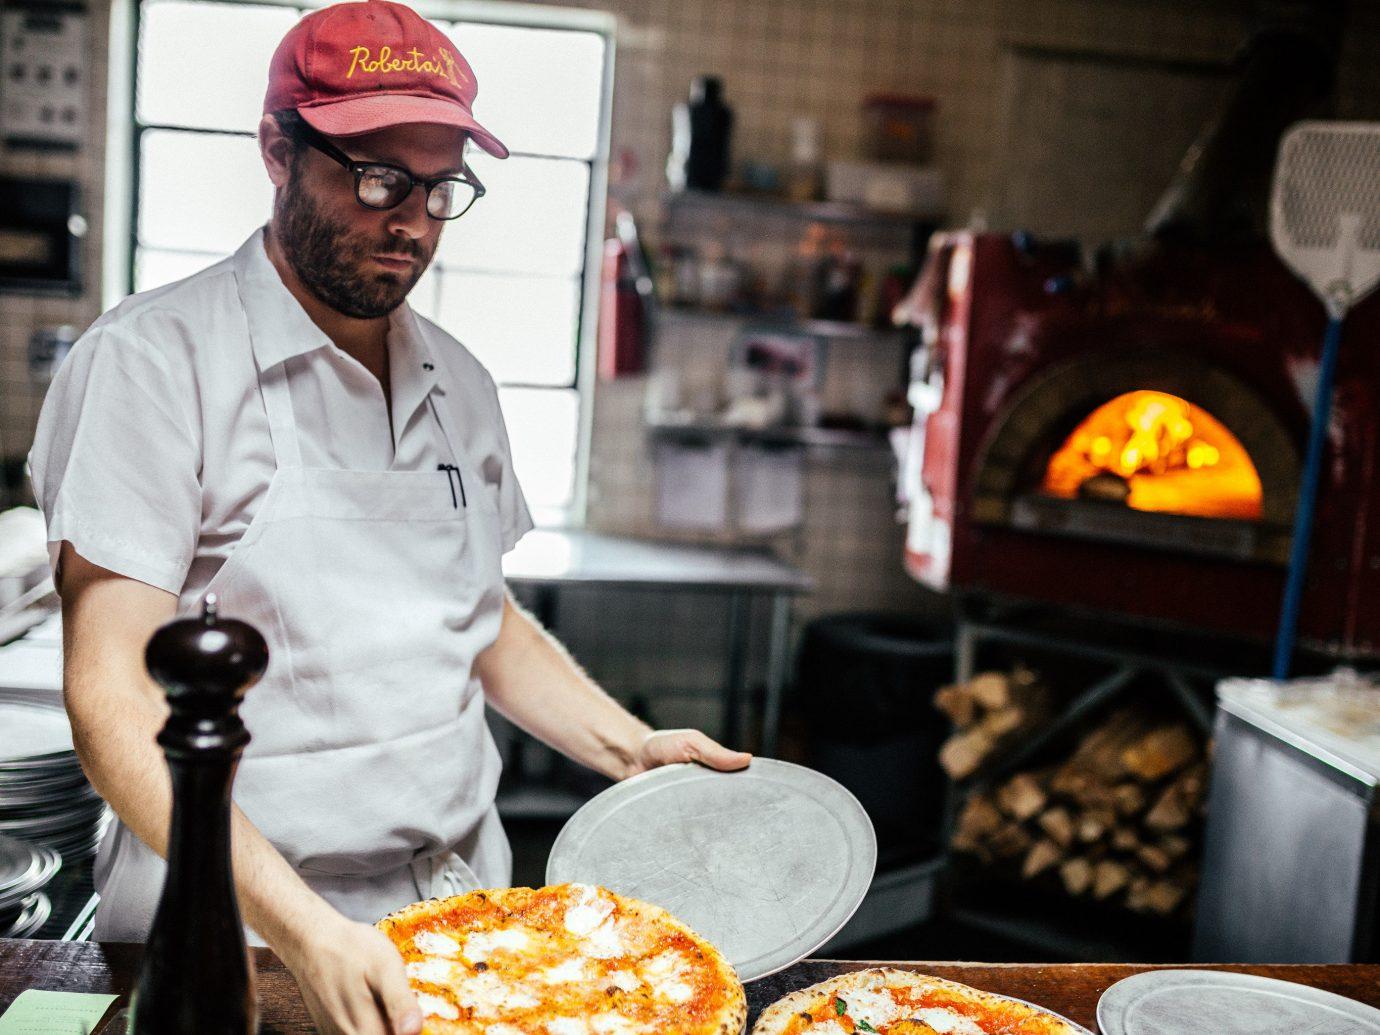 Person making pizza at Roberta's